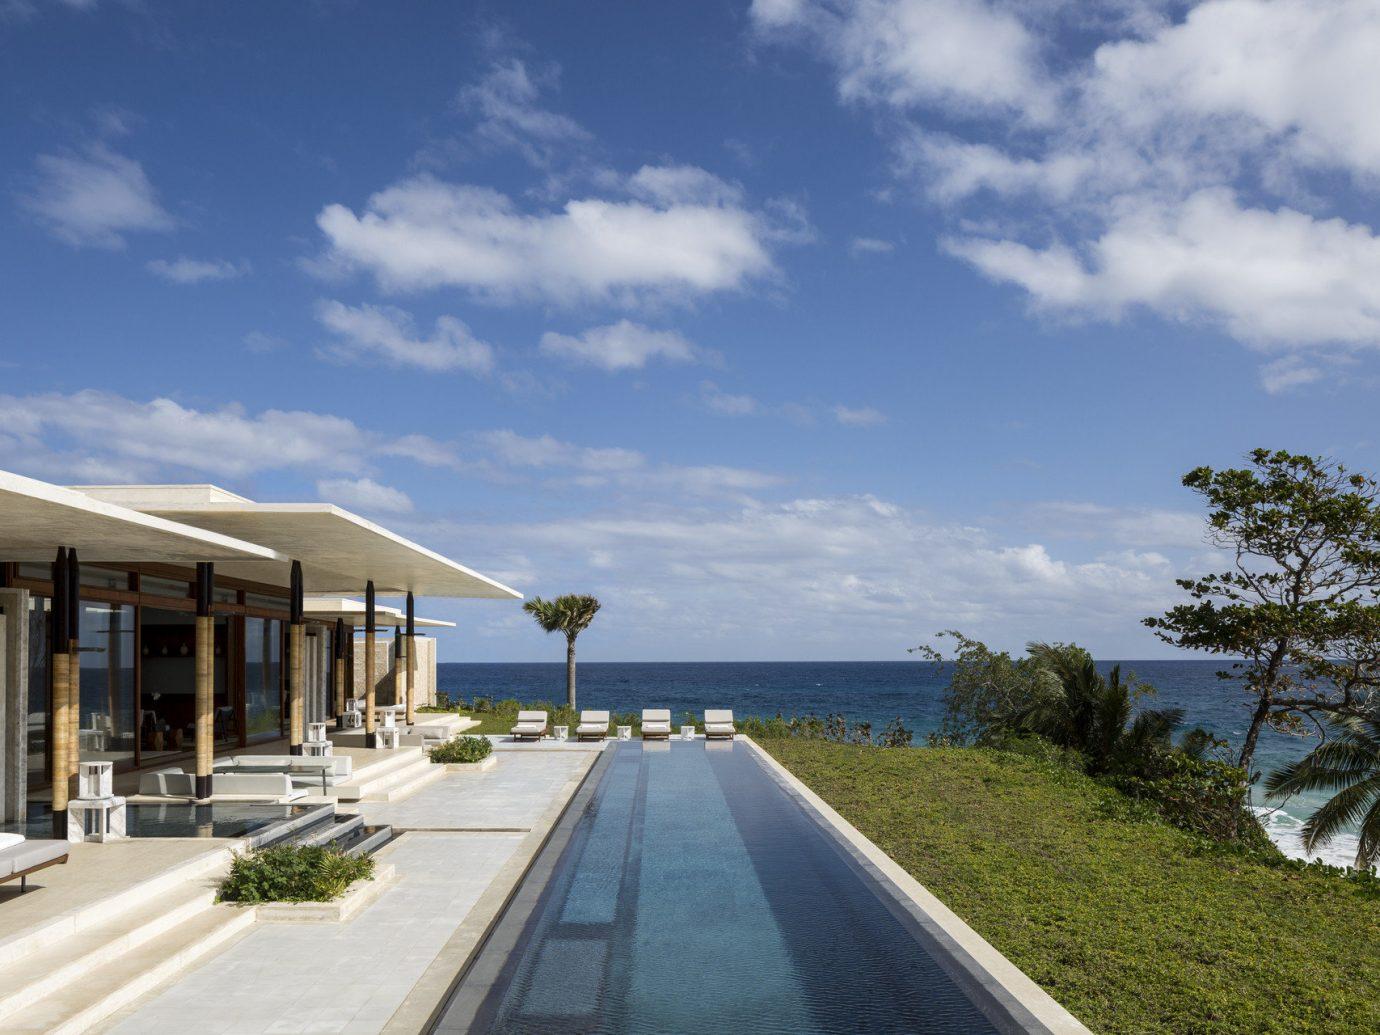 Pool At Hotel Amanera In Rio San Juan - Dominican Republic